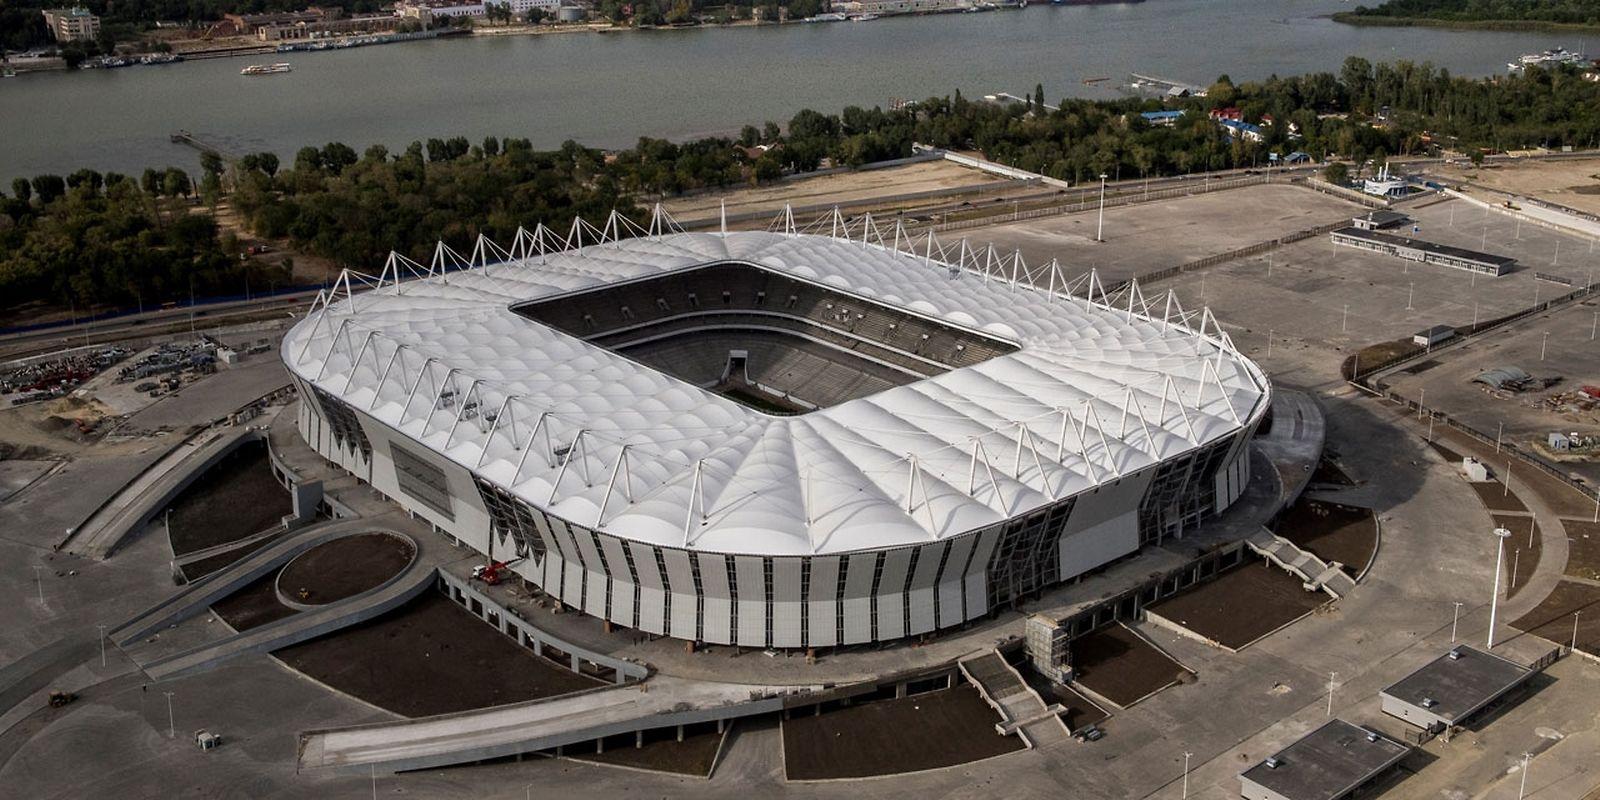 Rostov Arena (45.000 places). Matchs disputés (5): Brésil - Suisse (17 juin), Uruguay - Arabie saoudite (20 juin), Corée du Sud - Mexique (23 juin), Islande - Croatie (26 juin), un huitième de finale (2 juillet).